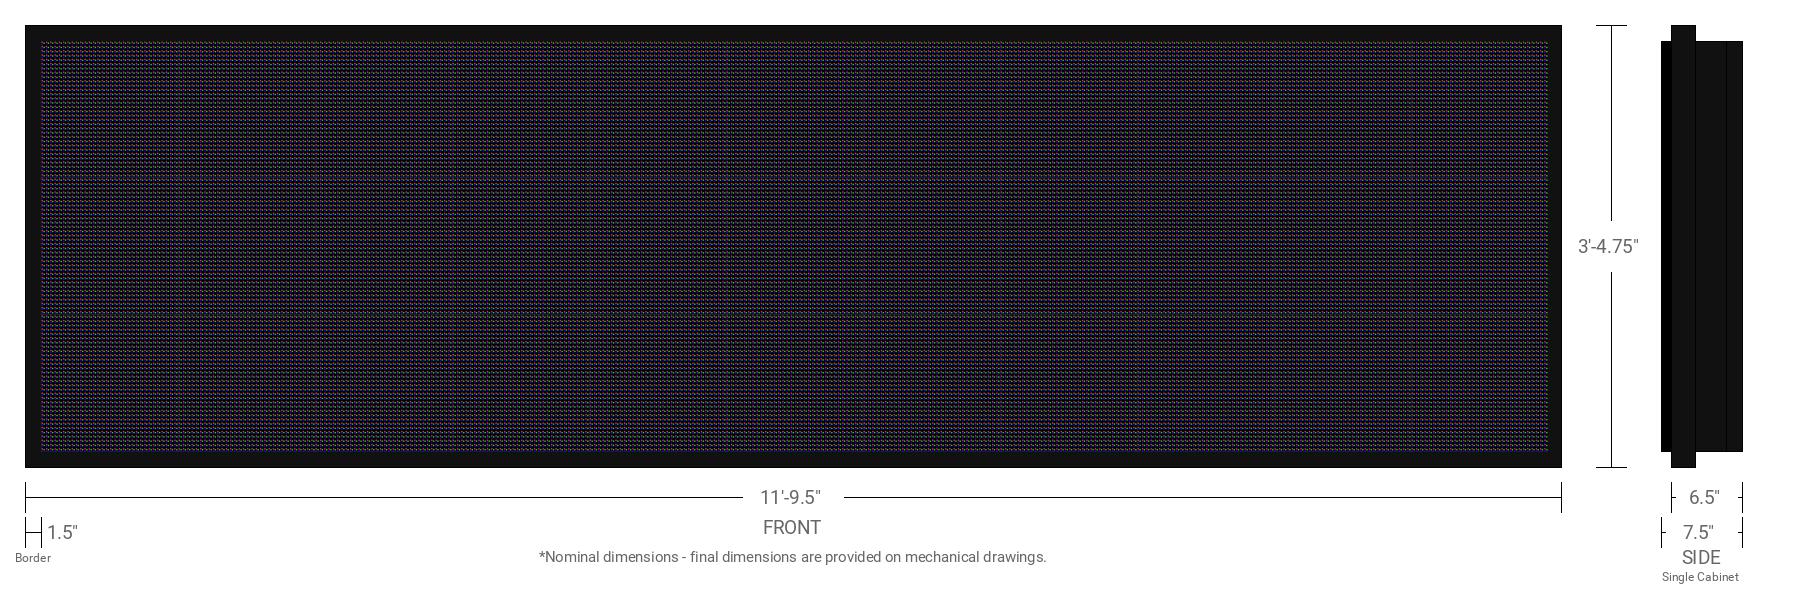 Polaris 10mm 96x352 Single Sided Full Color LED Display